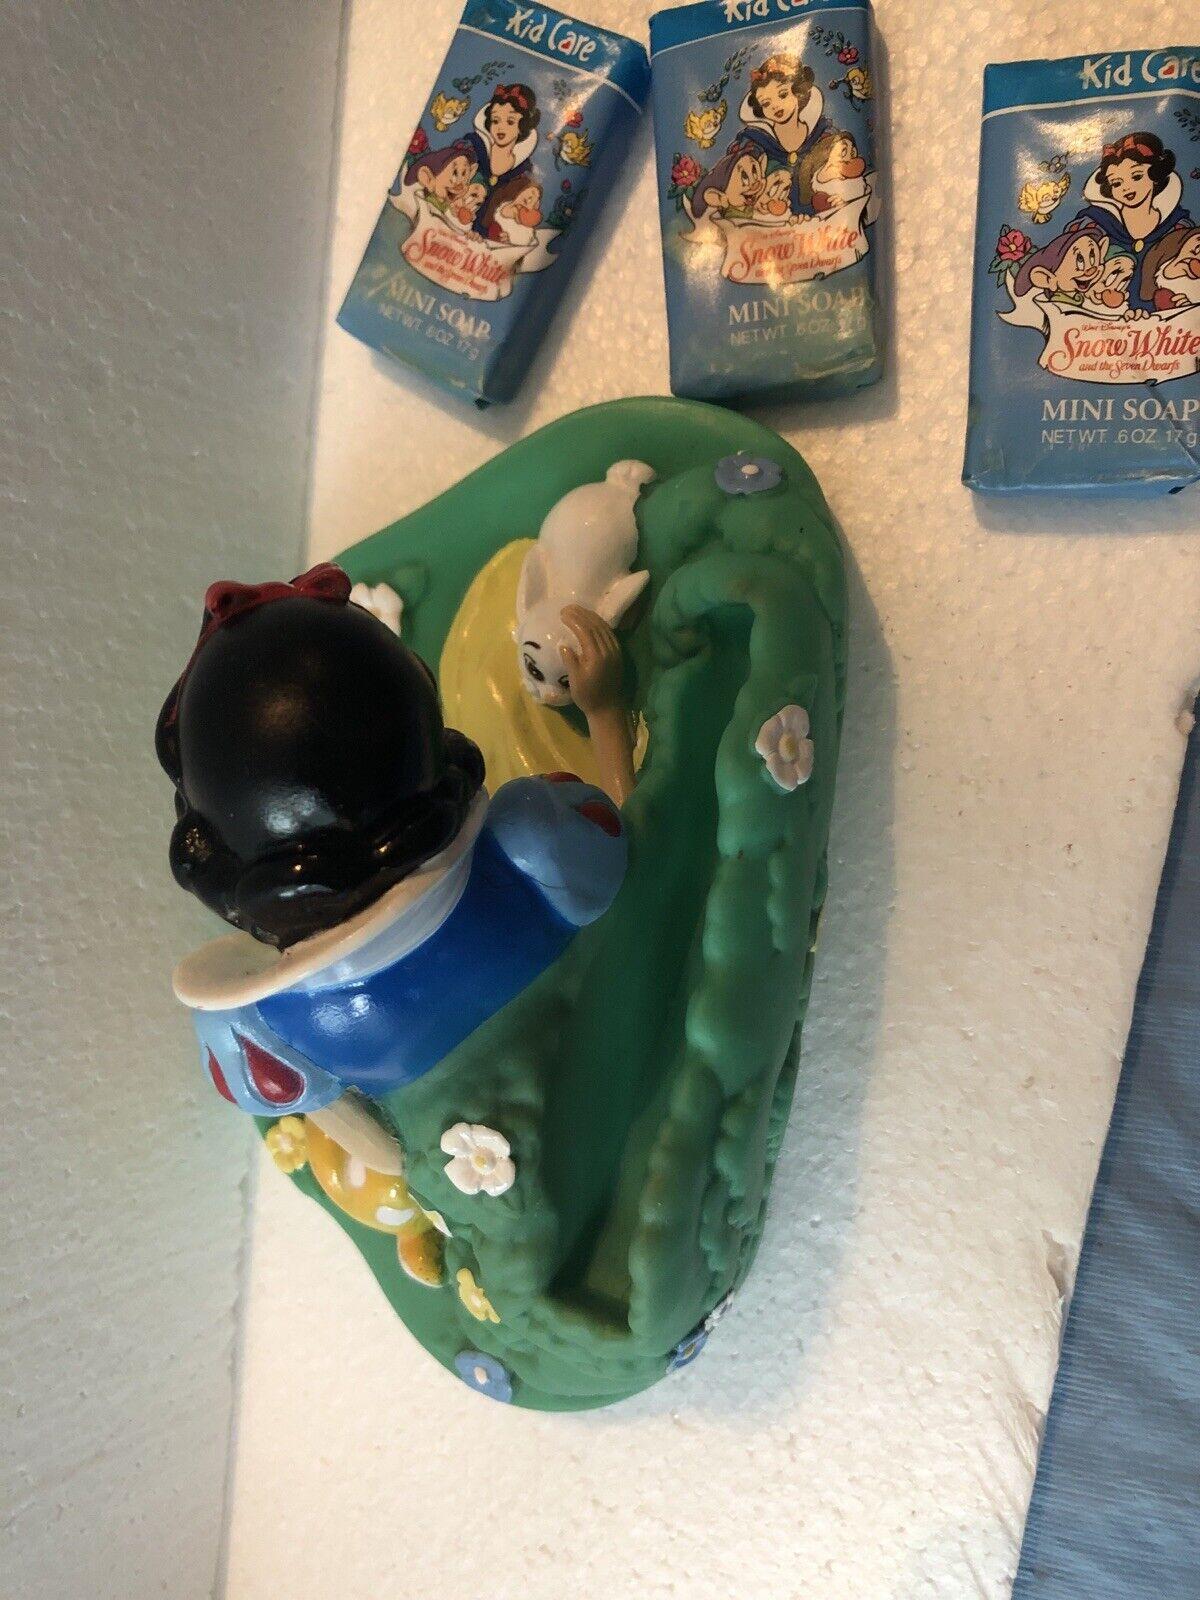 Vintage Snow White Floating Soap Dish {Plastic 1990s Disney Tsumura The Walt Disney Company} Snow White seven Dwarfs Soap Dish Container Toy